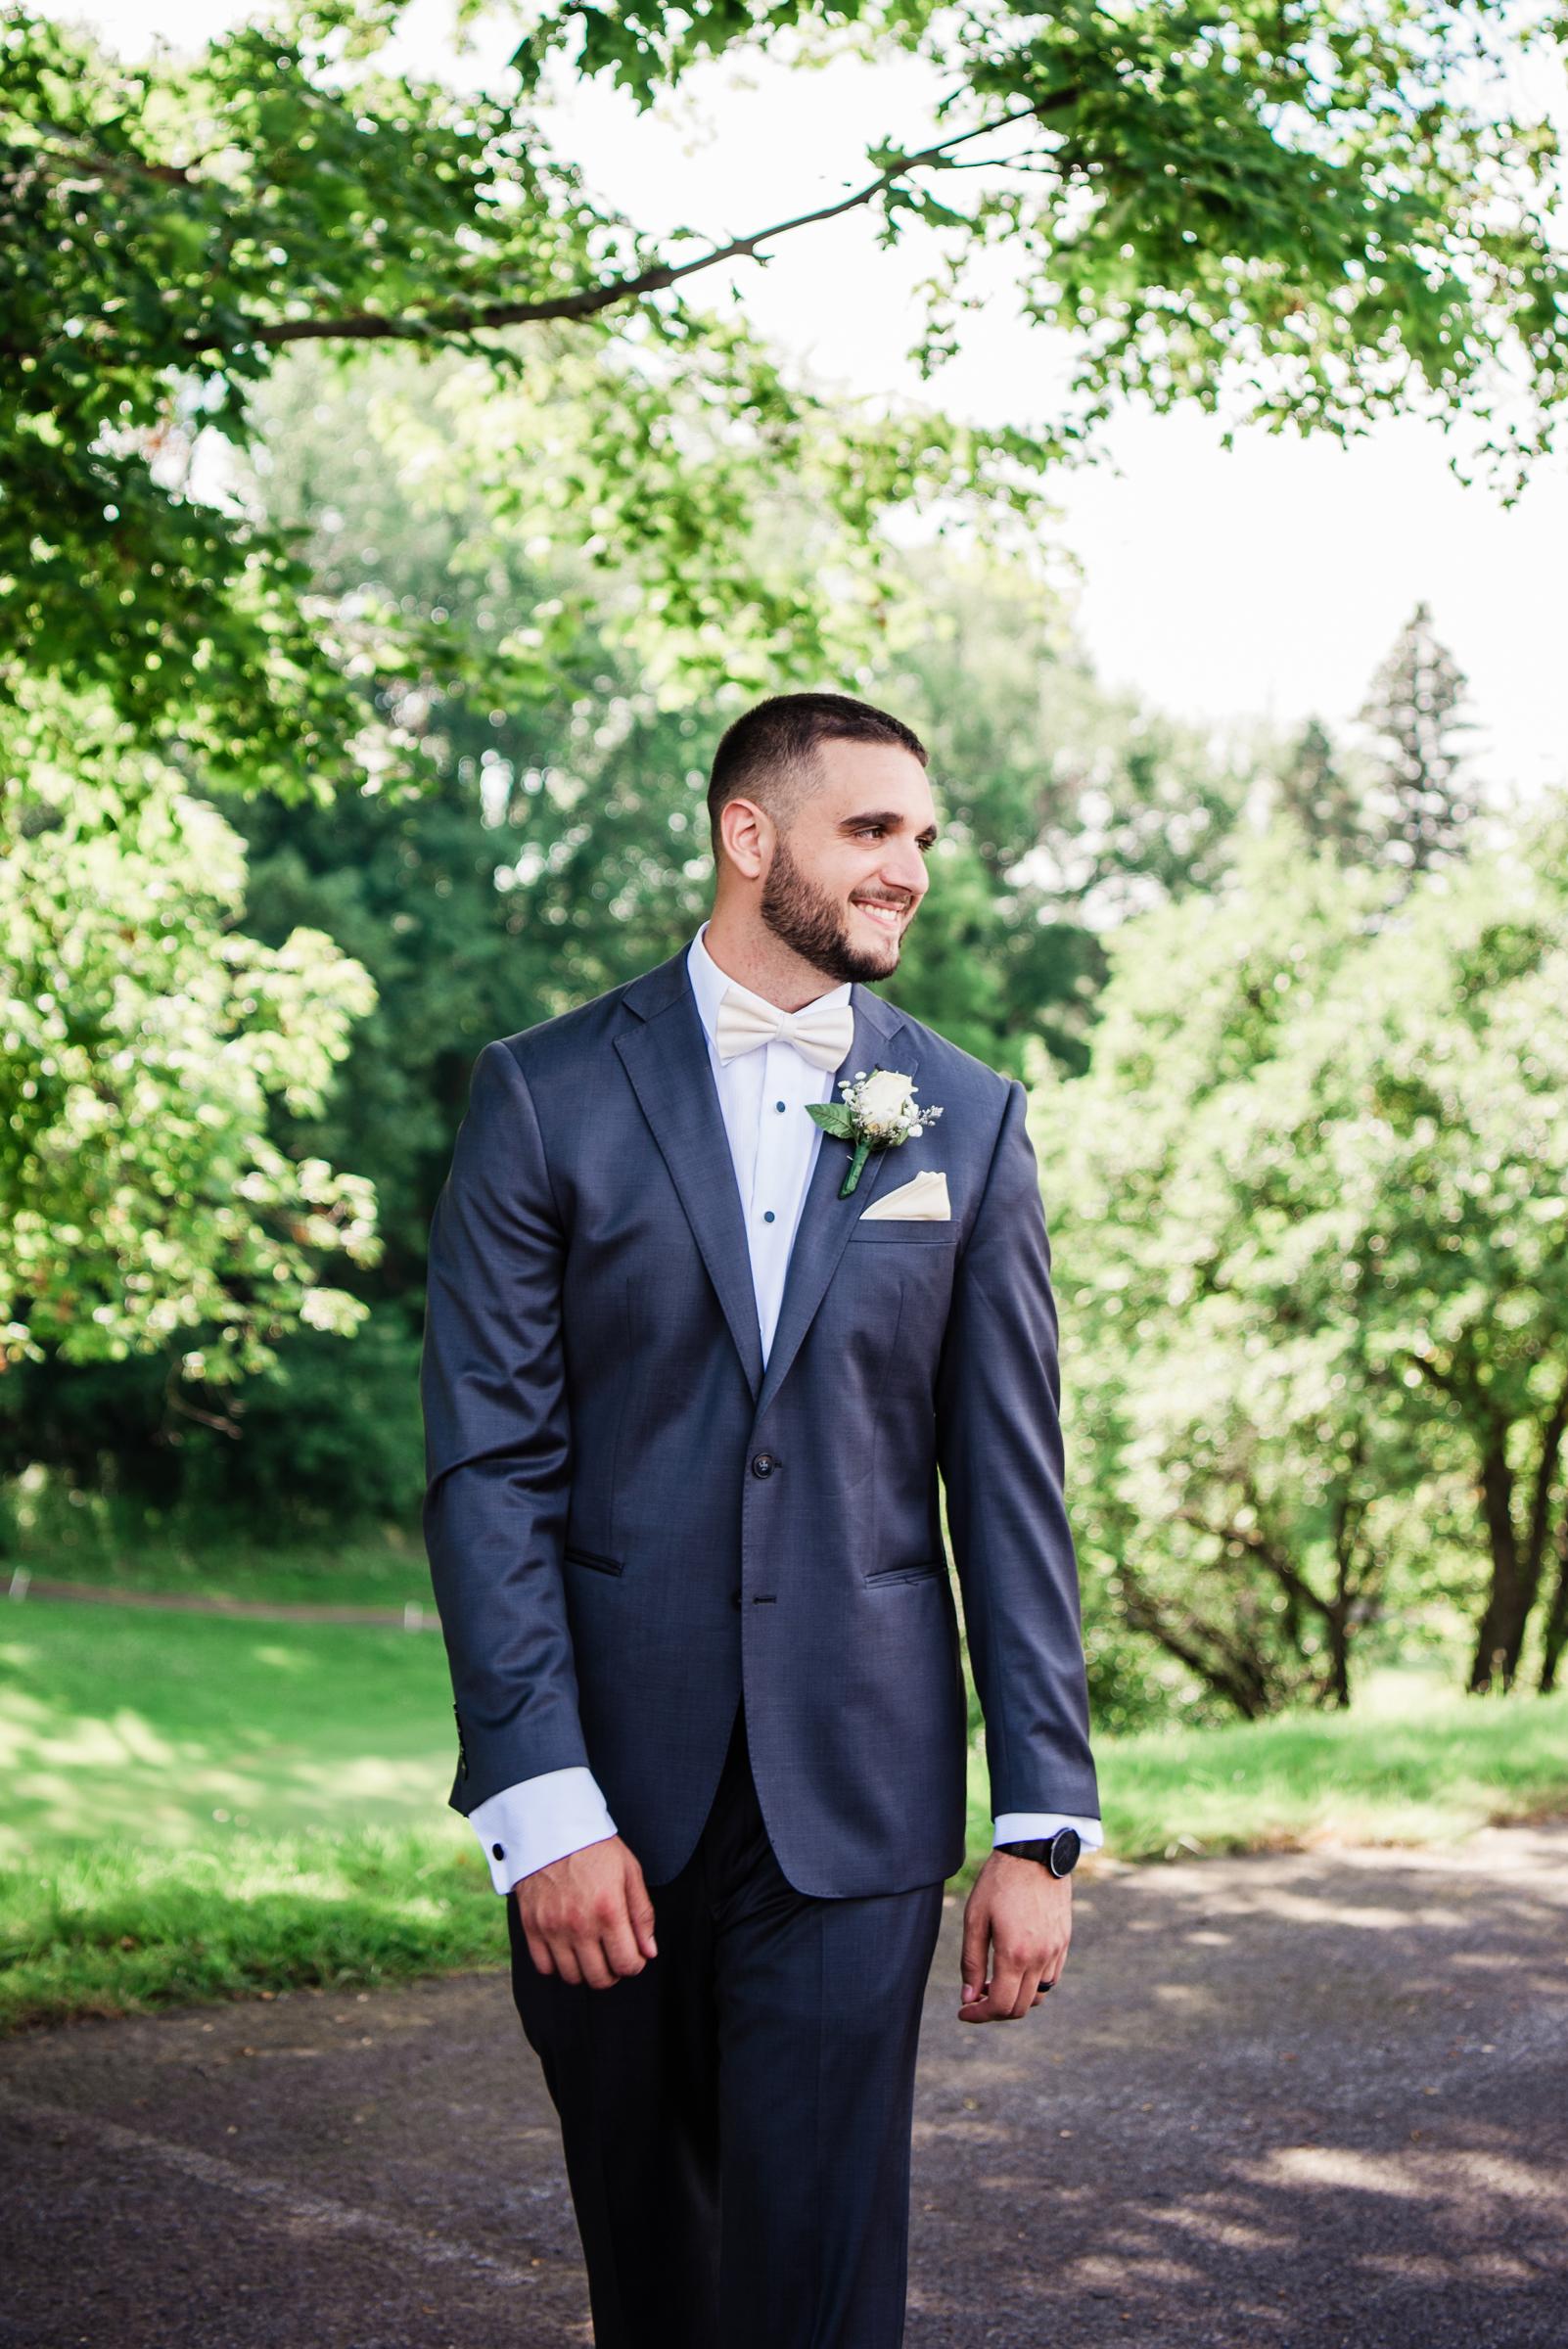 Historic_Old_St_Johns_Church_Valentinos_Banquet_Hall_Central_NY_Wedding_JILL_STUDIO_Rochester_NY_Photographer_DSC_6276.jpg